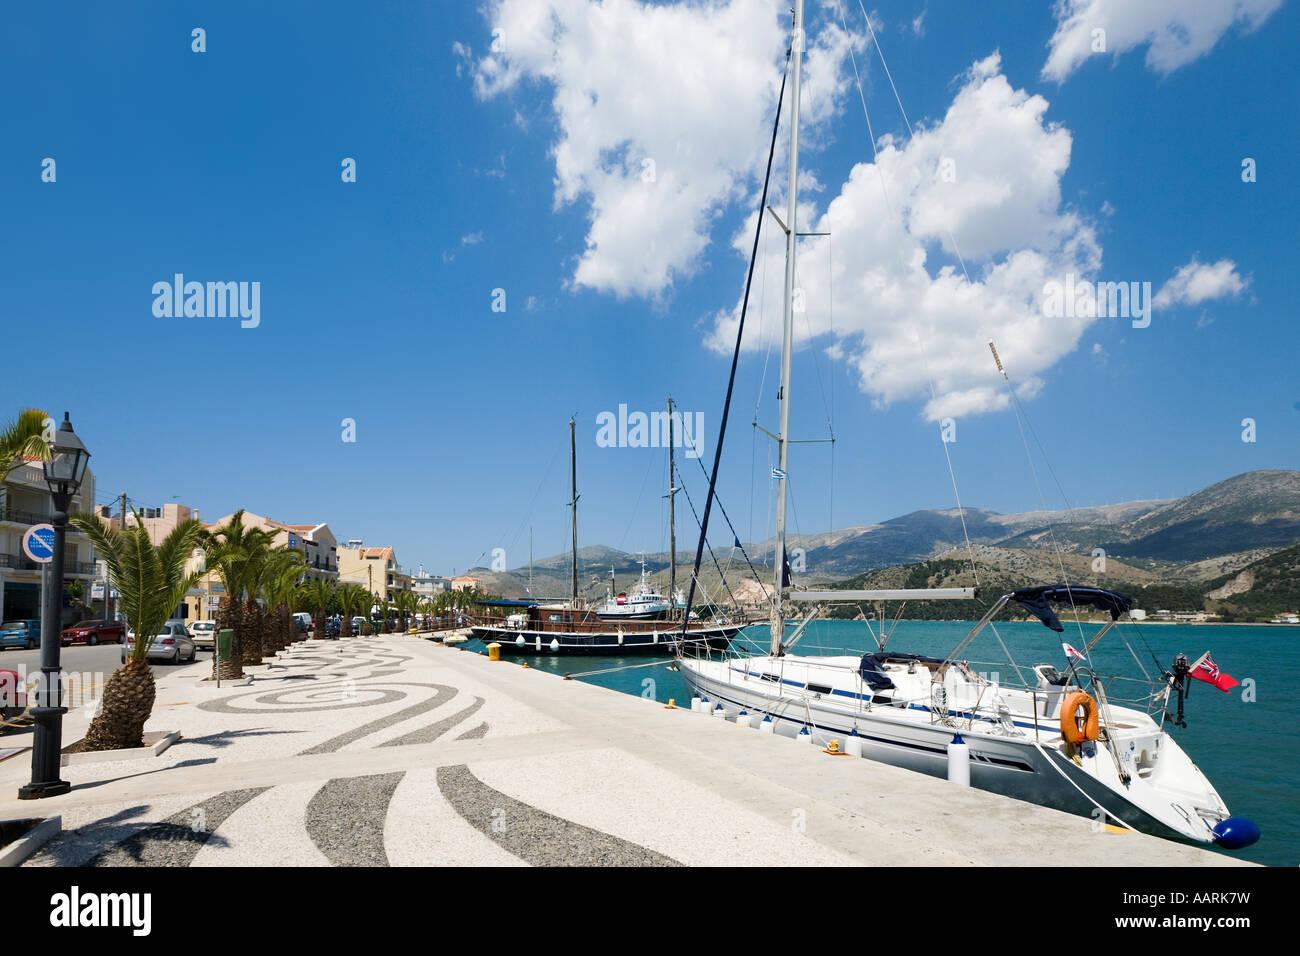 Harbour and Seafront Promenade, Argostoli, Kefalonia, Ionian Islands, Greece - Stock Image